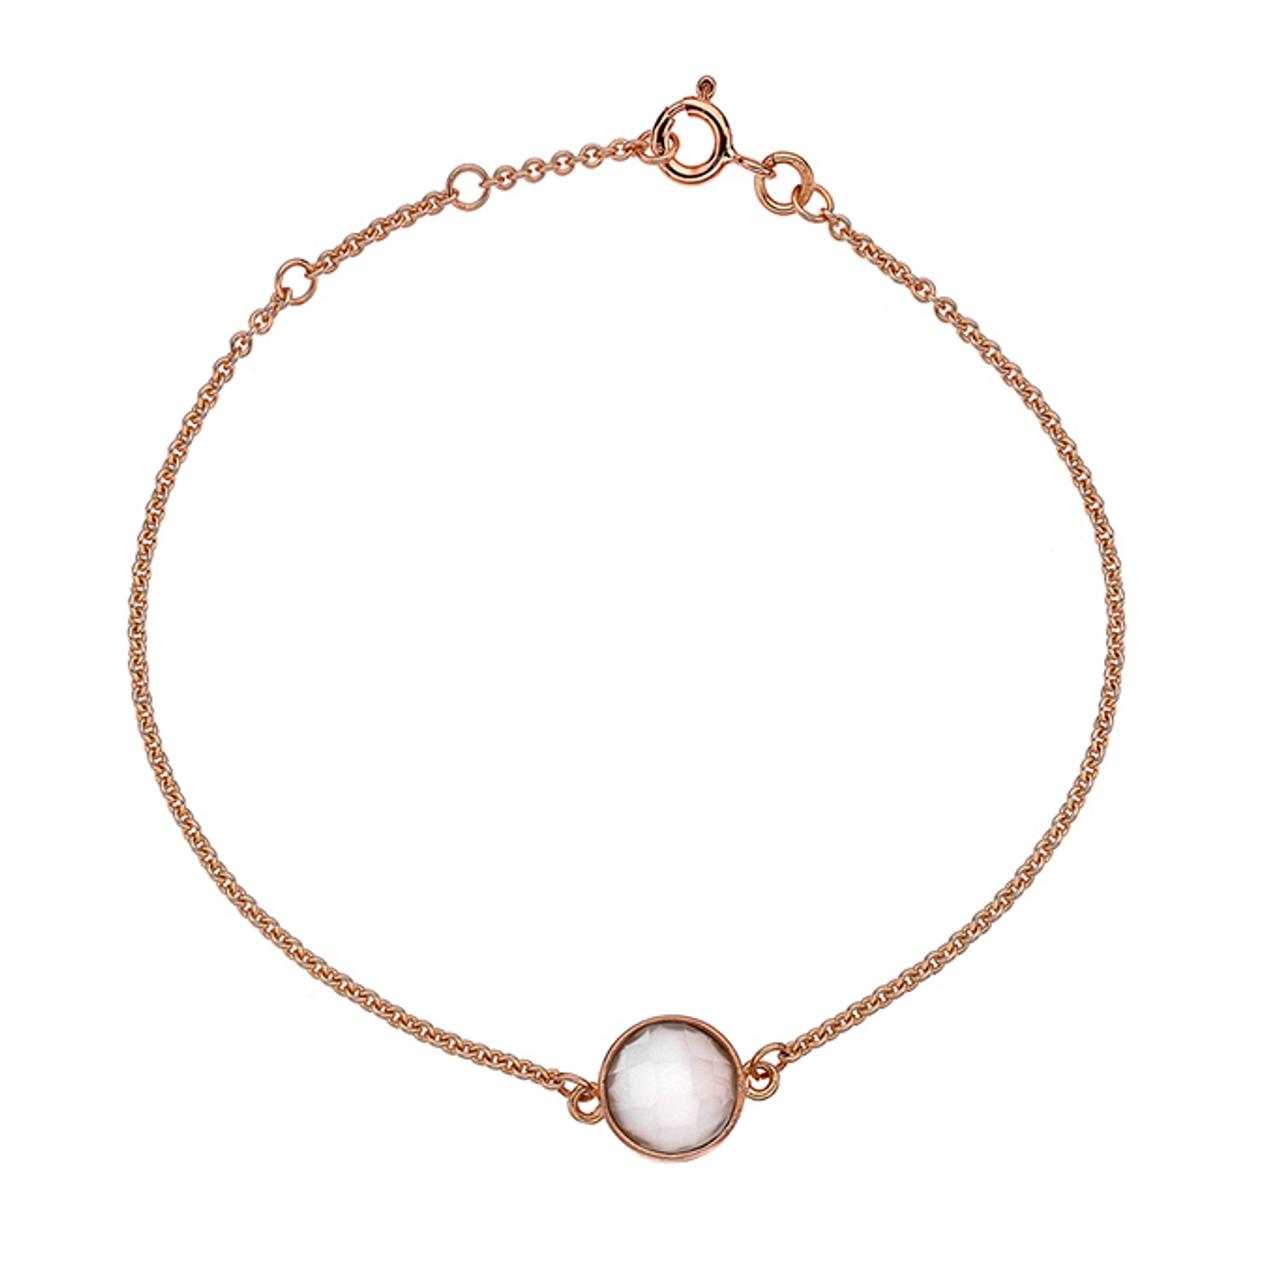 9ct Rose Gold & Moonstone Bracelet